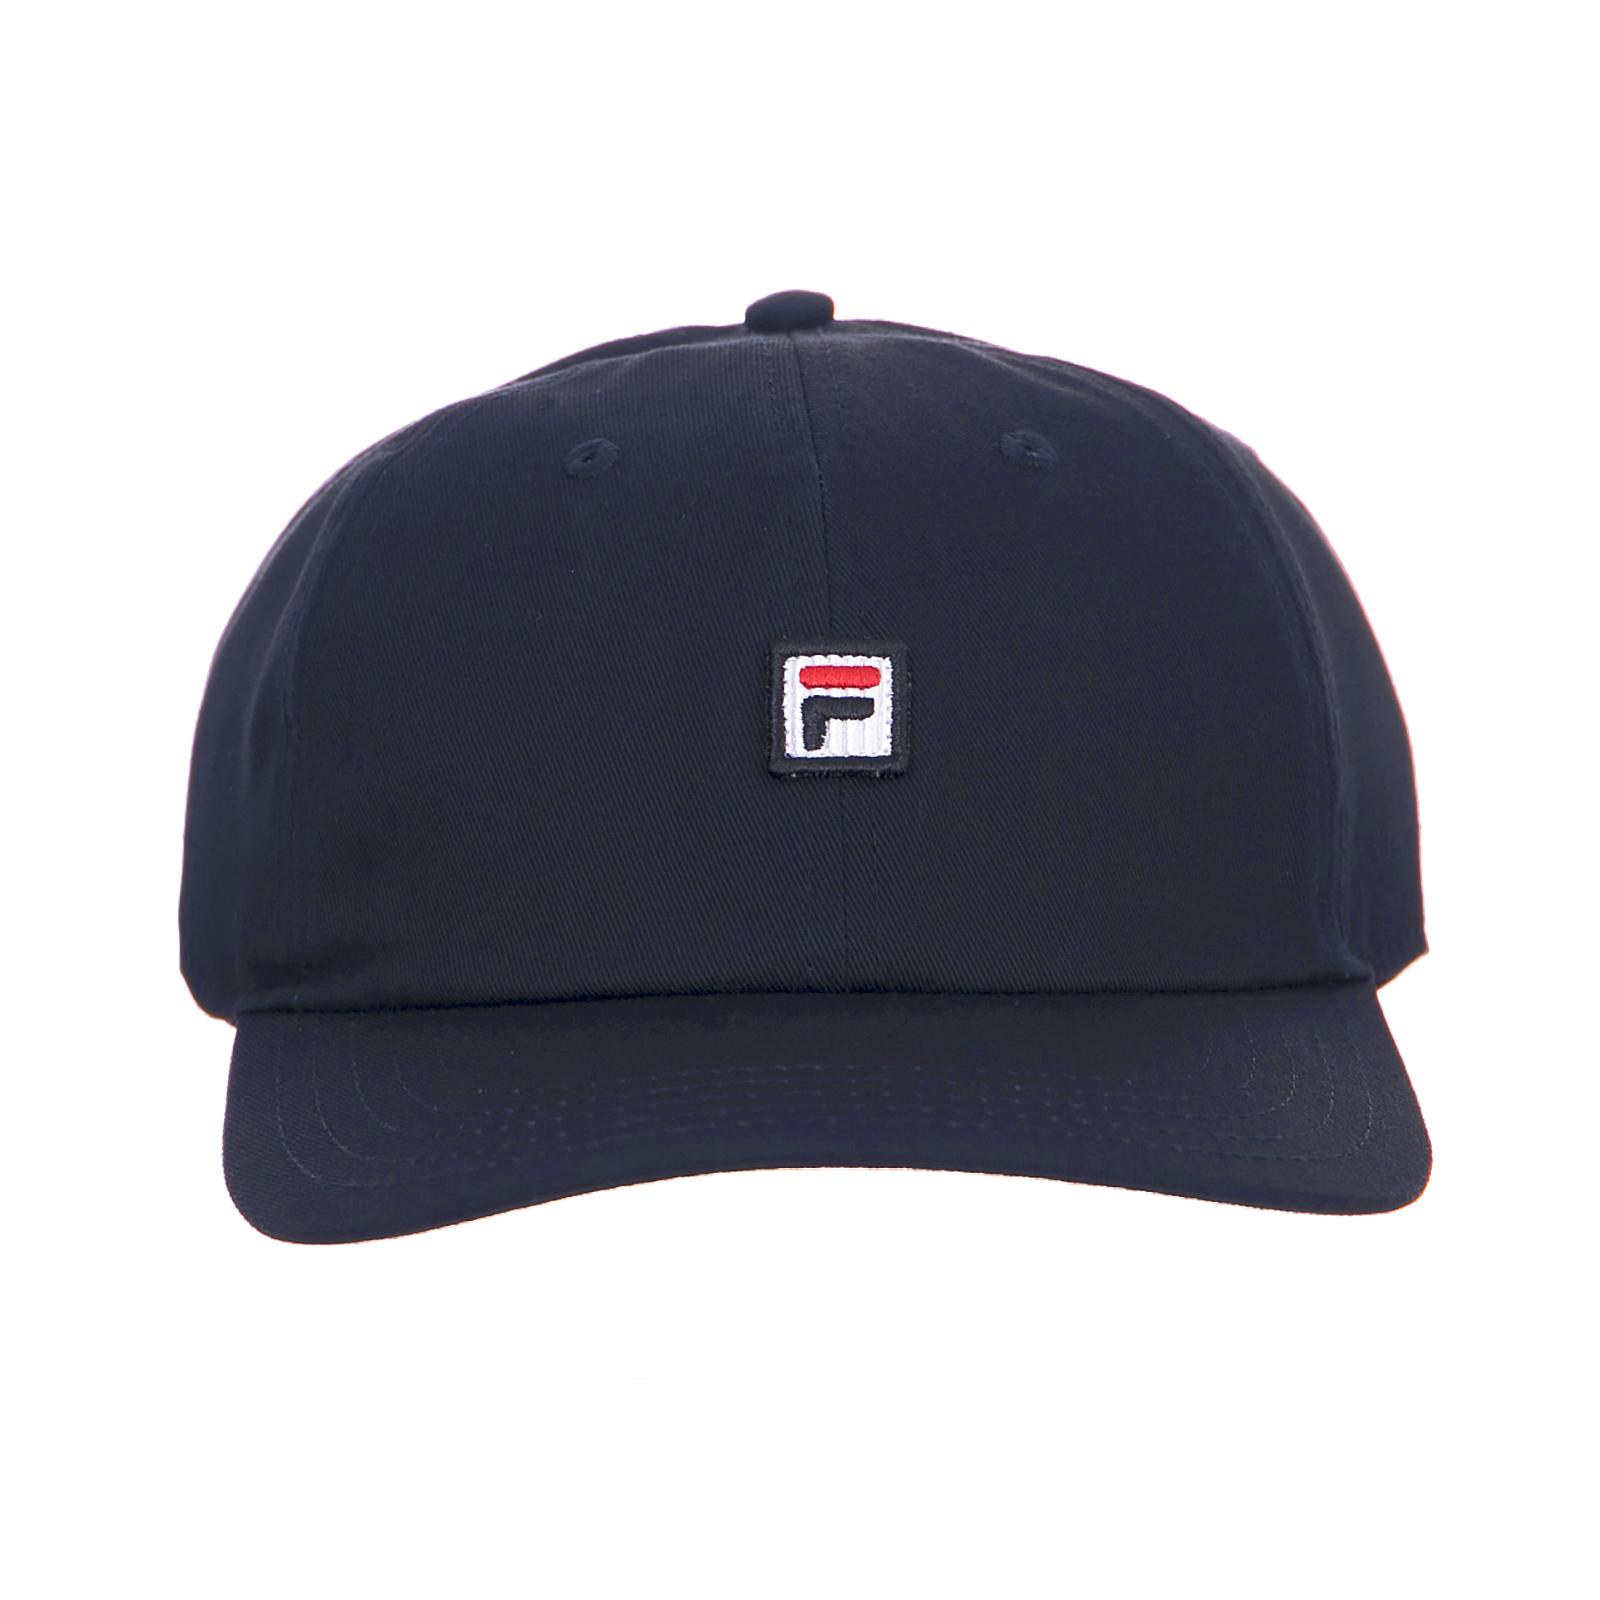 4a36ce2a Fila Hat Dad Cap Hat Strap Back Black Black Iris | eBay